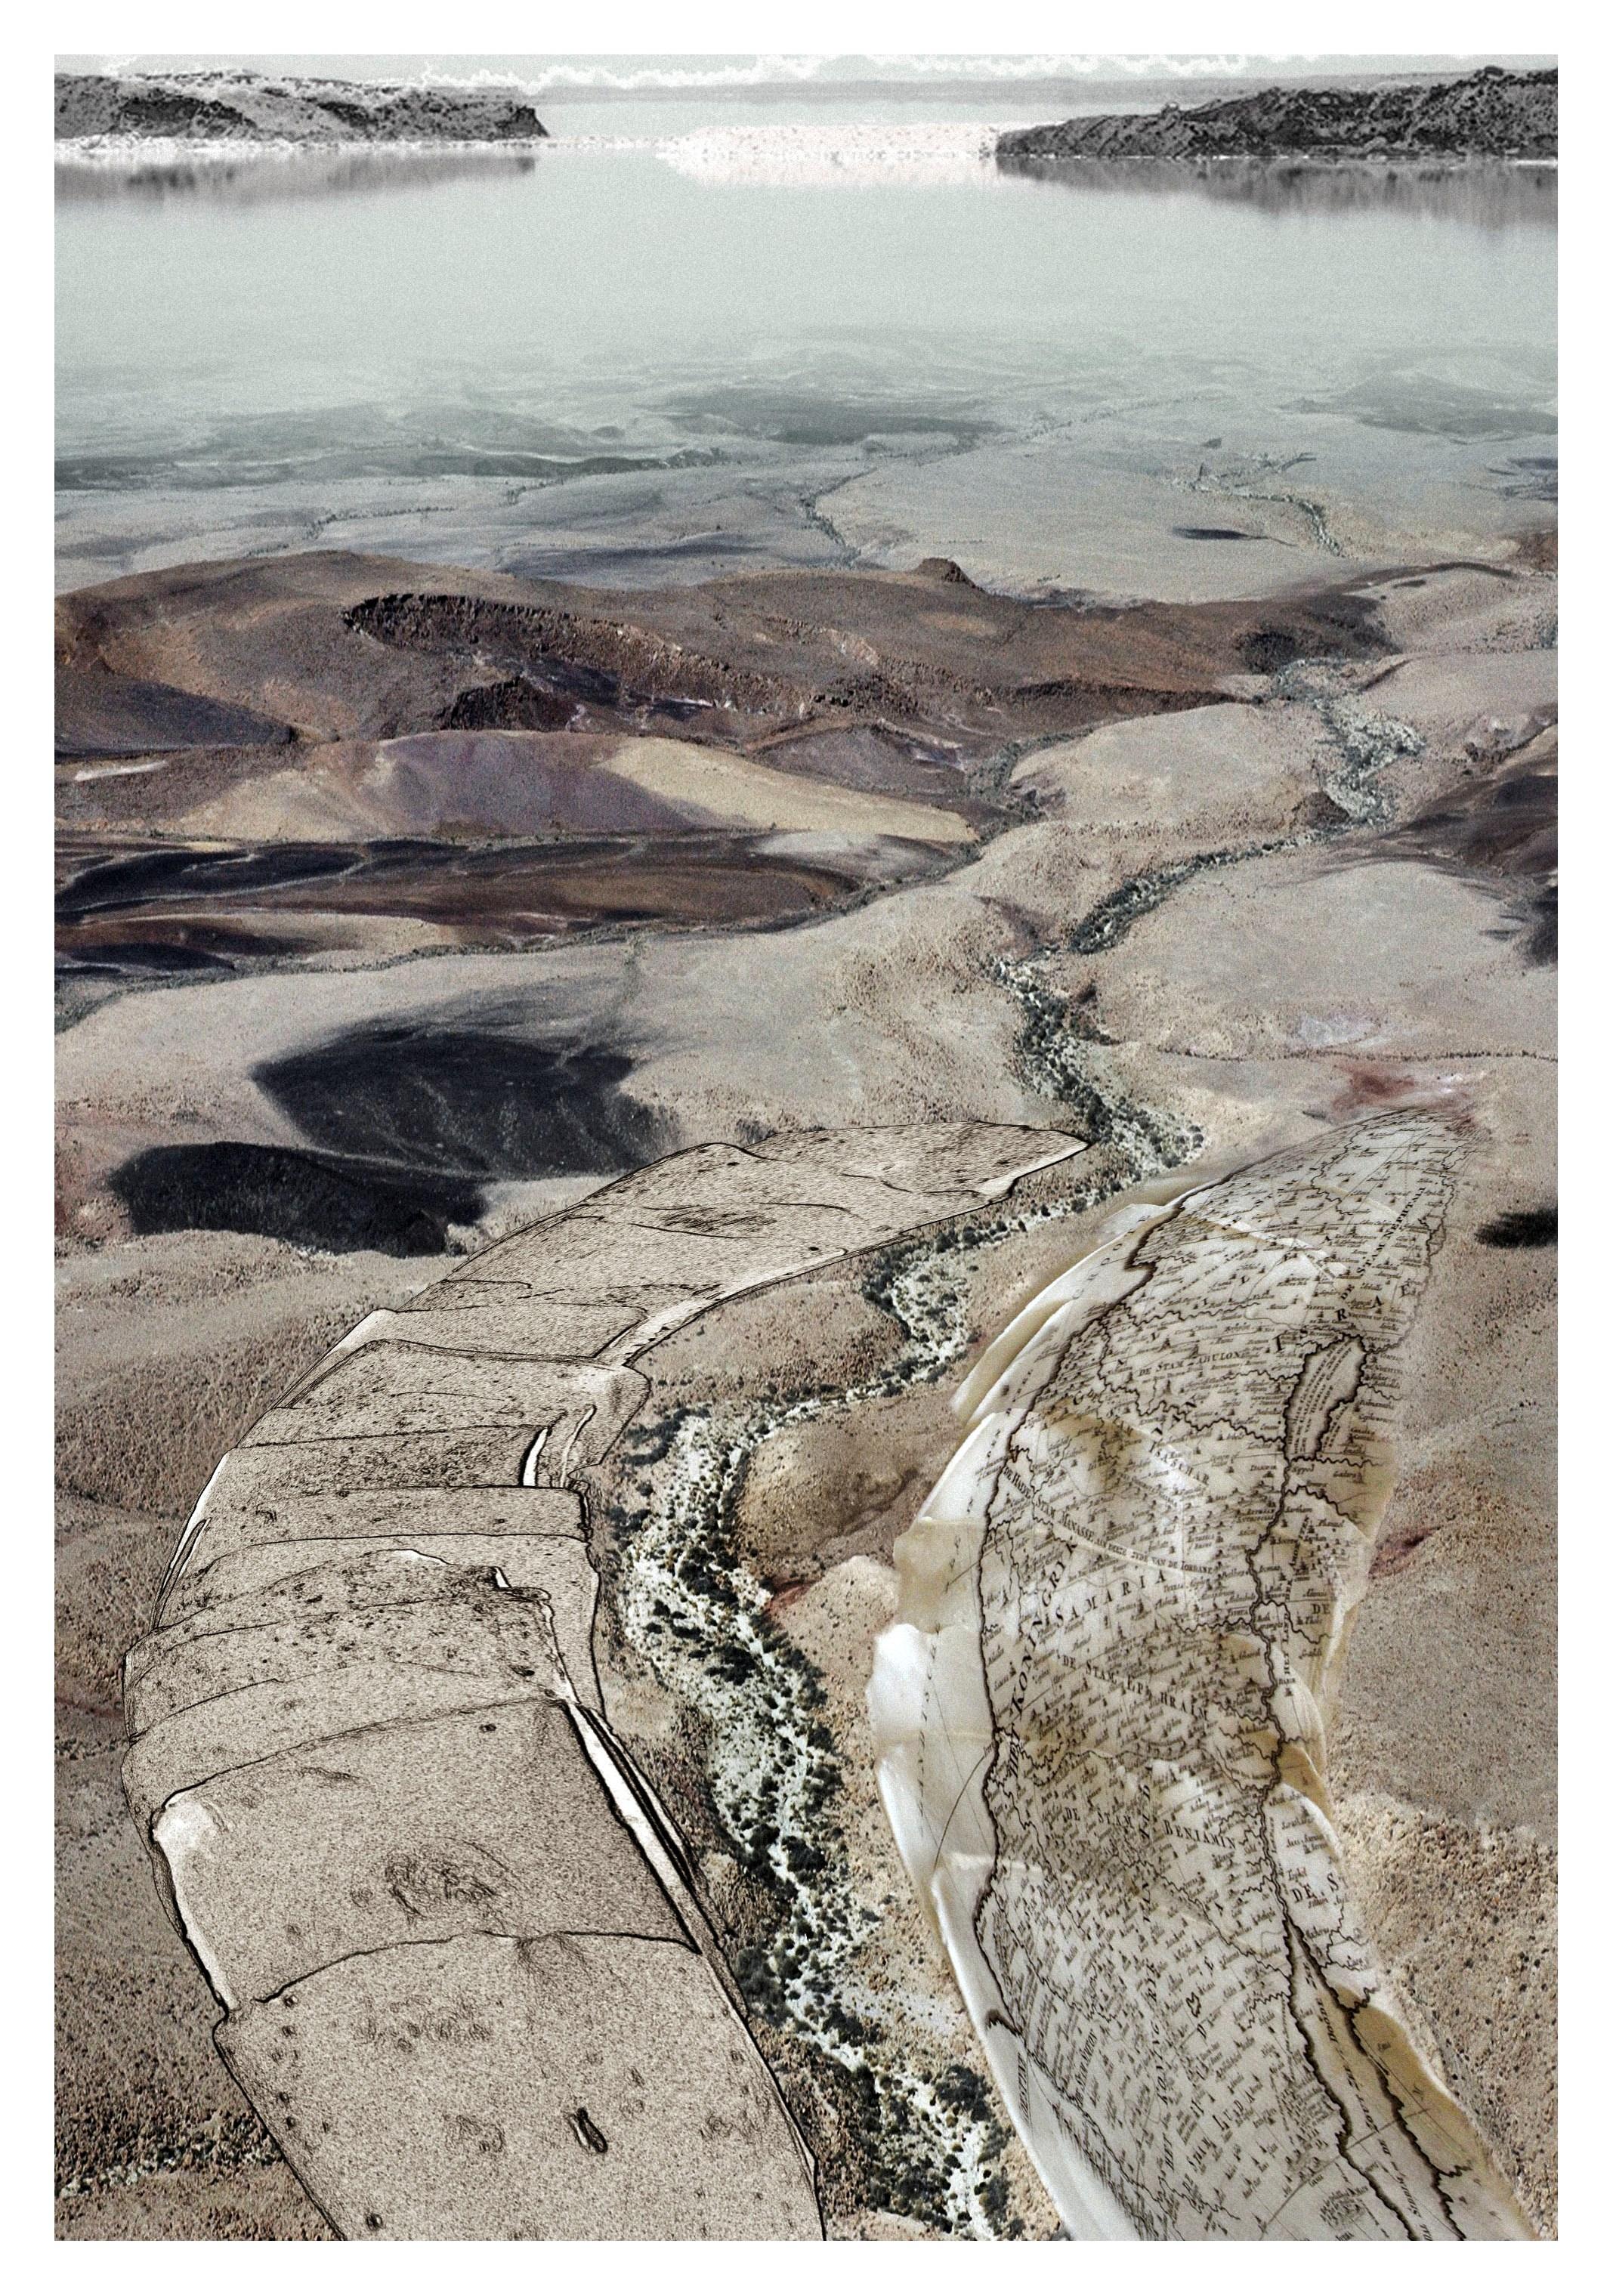 Copy of Dorit Feldman - Reflective Geophilosophy